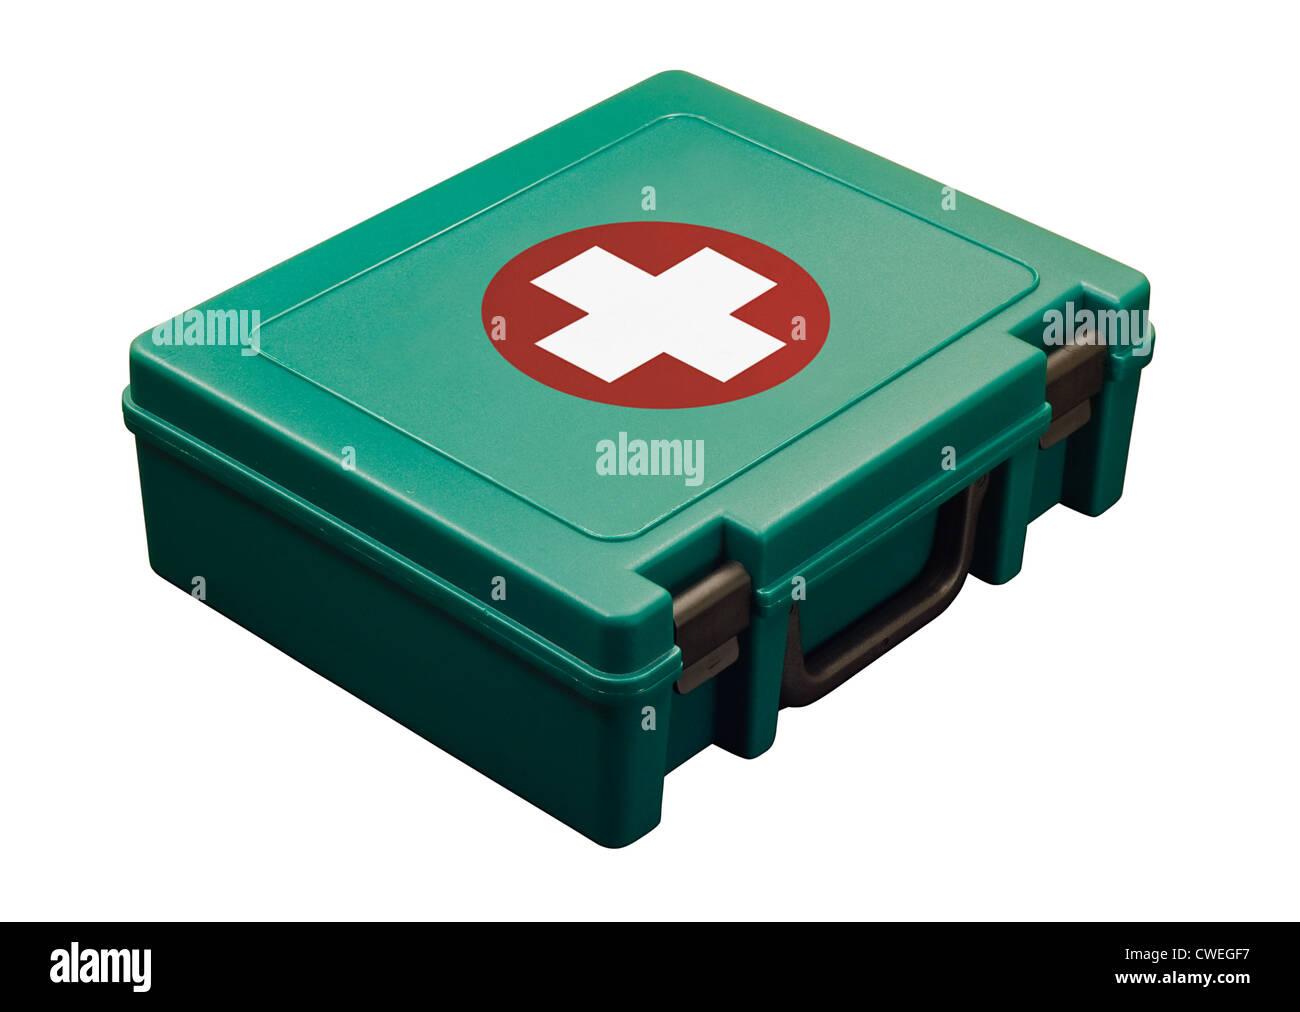 Trousse de premiers secours standard isolated on white Banque D'Images